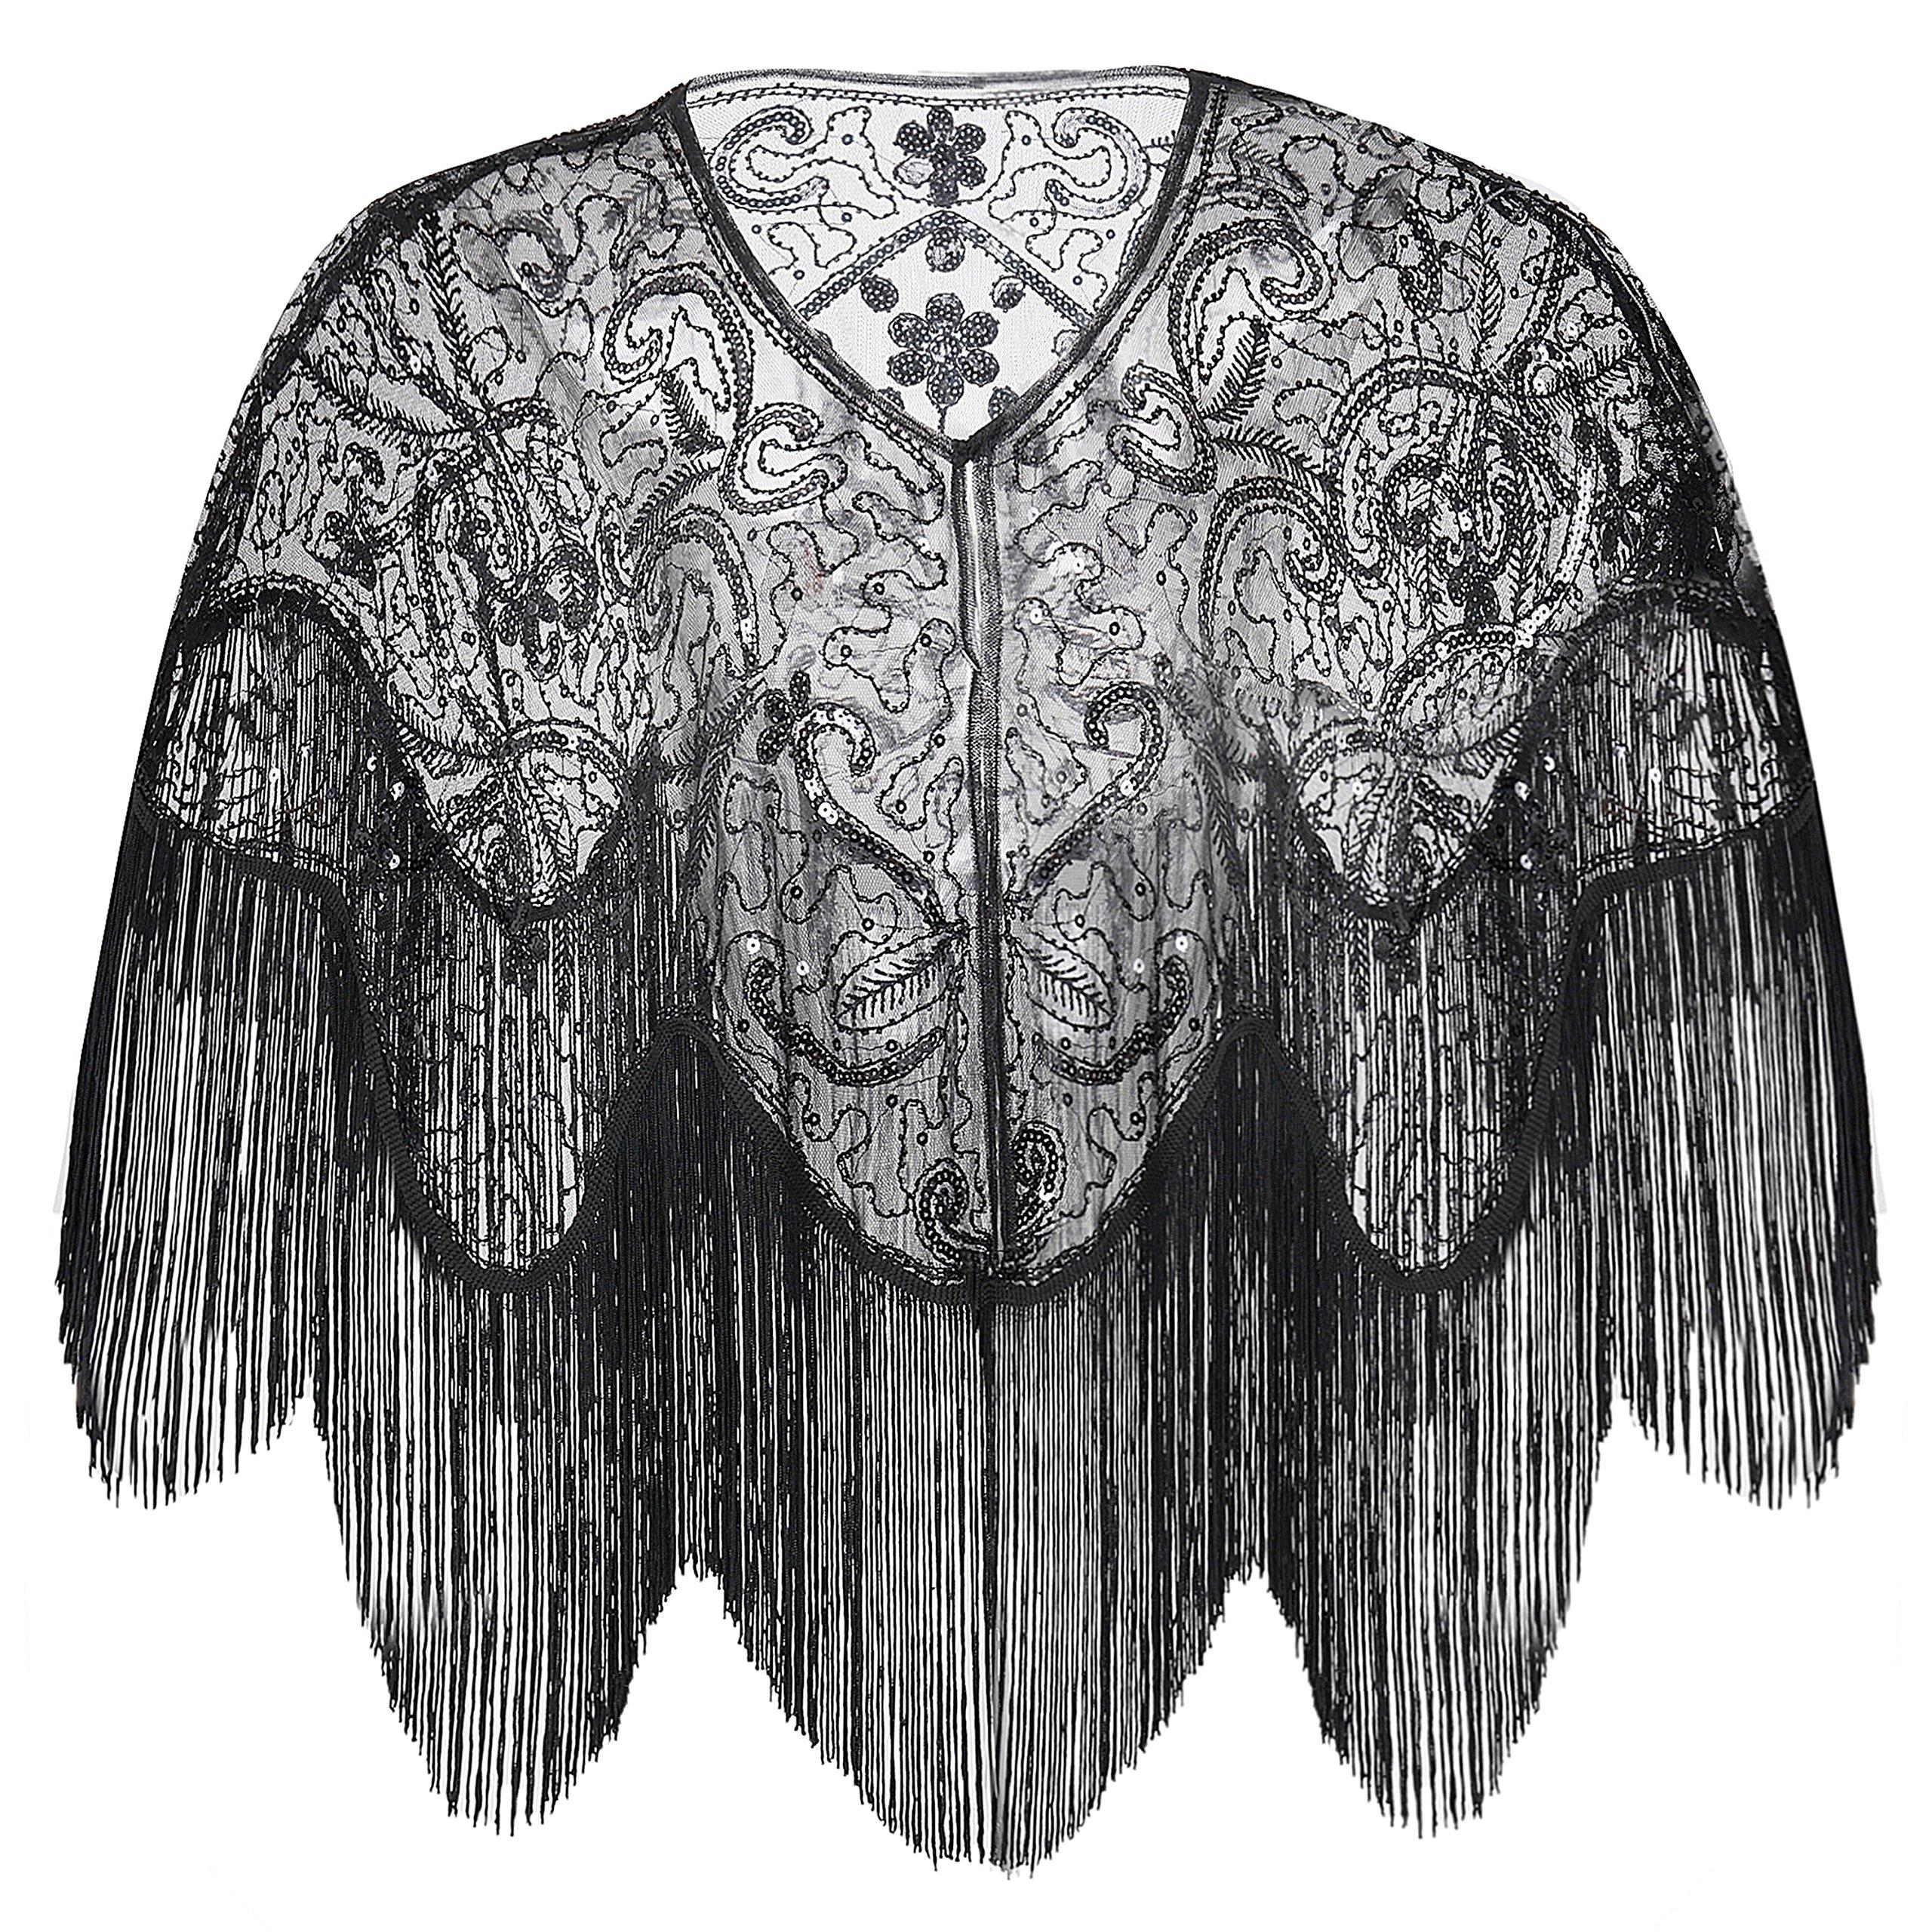 BABEYOND 1920s Shawl Wraps Gatsby Beaded Evening Cape Bridal Shawl for Evening Dresses Wedding Party (Black)